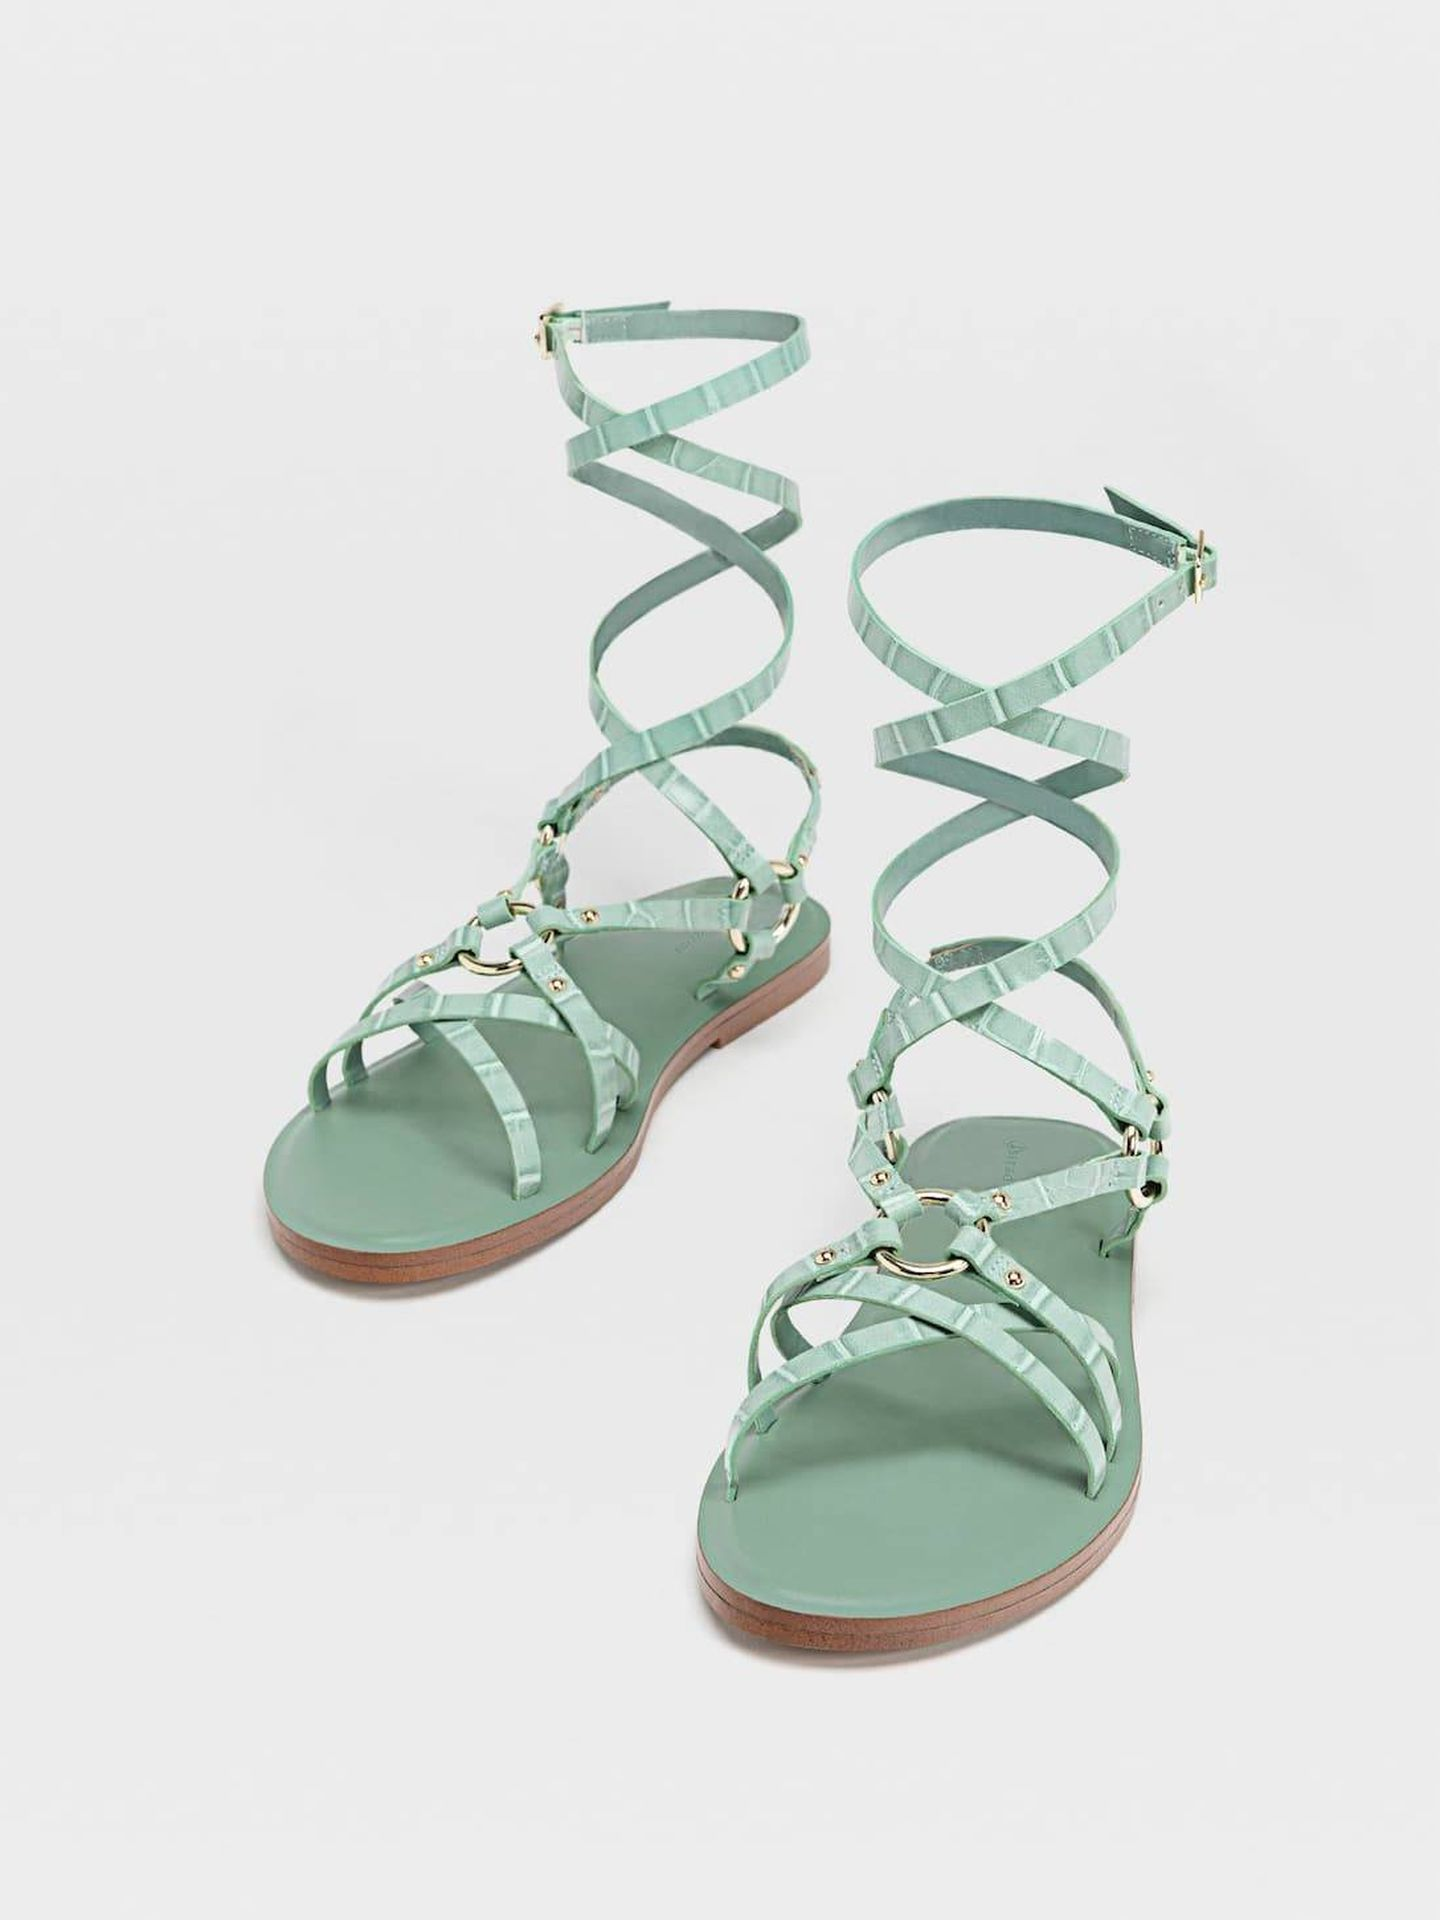 Las nuevas sandalias de Stradivarius. (Cortesía)